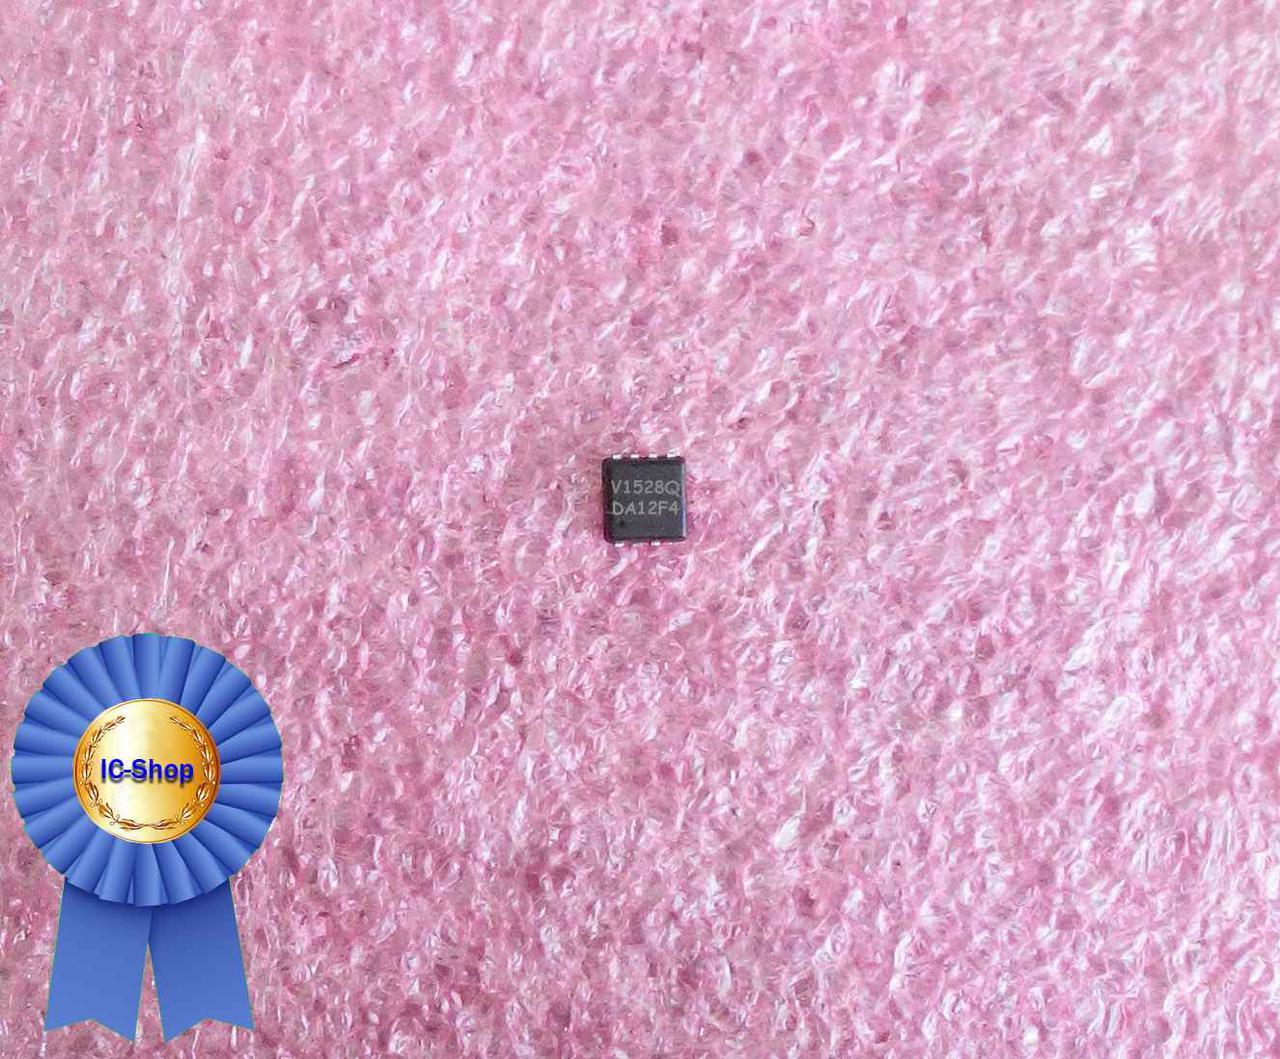 Микросхема MDV1528Q ( V1528Q )